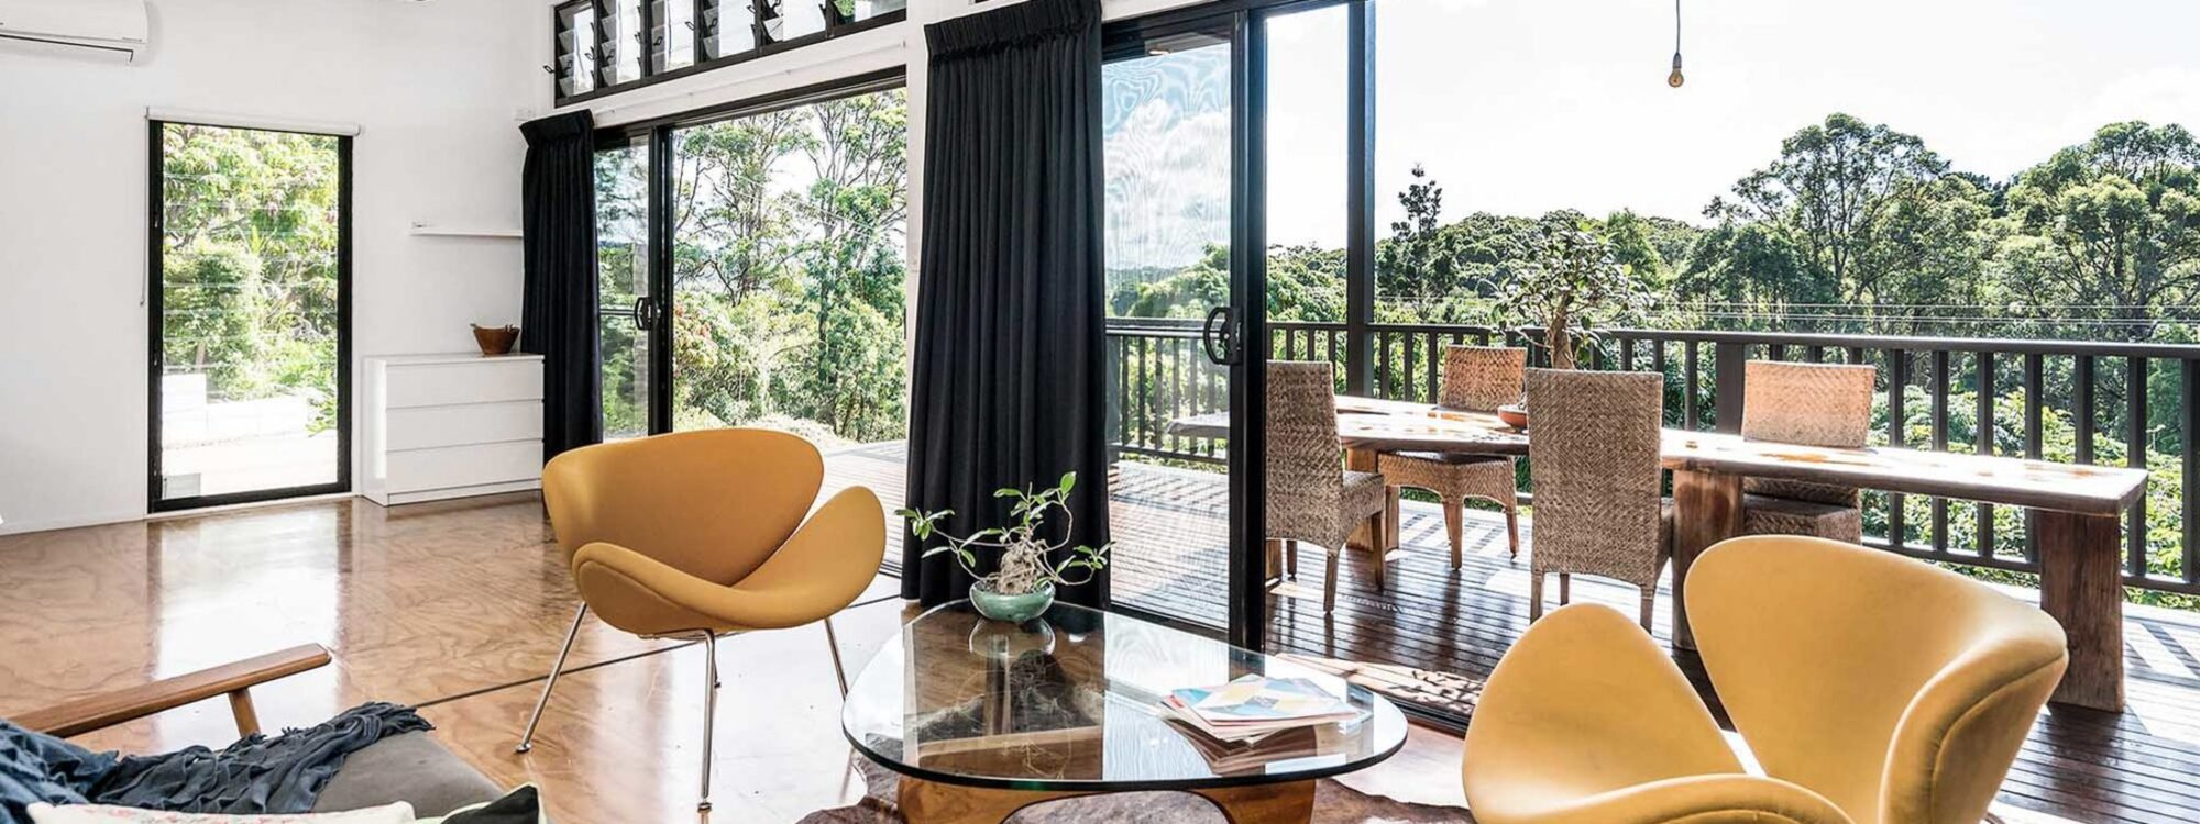 Ourmuli Cabin - Byron Bay - Lounge towards entrance